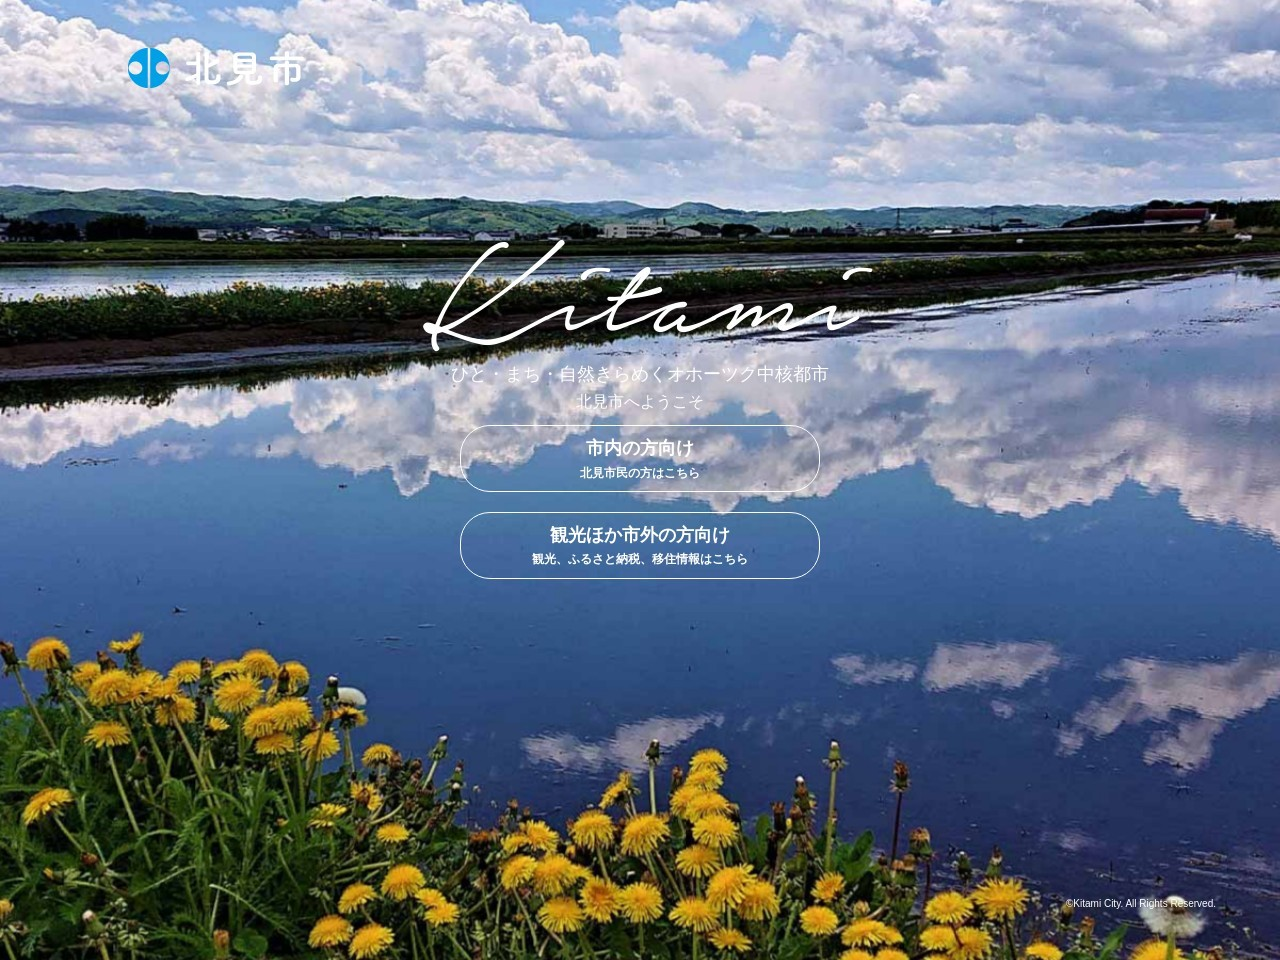 http://www.city.kitami.lg.jp/docs/2011042700108/